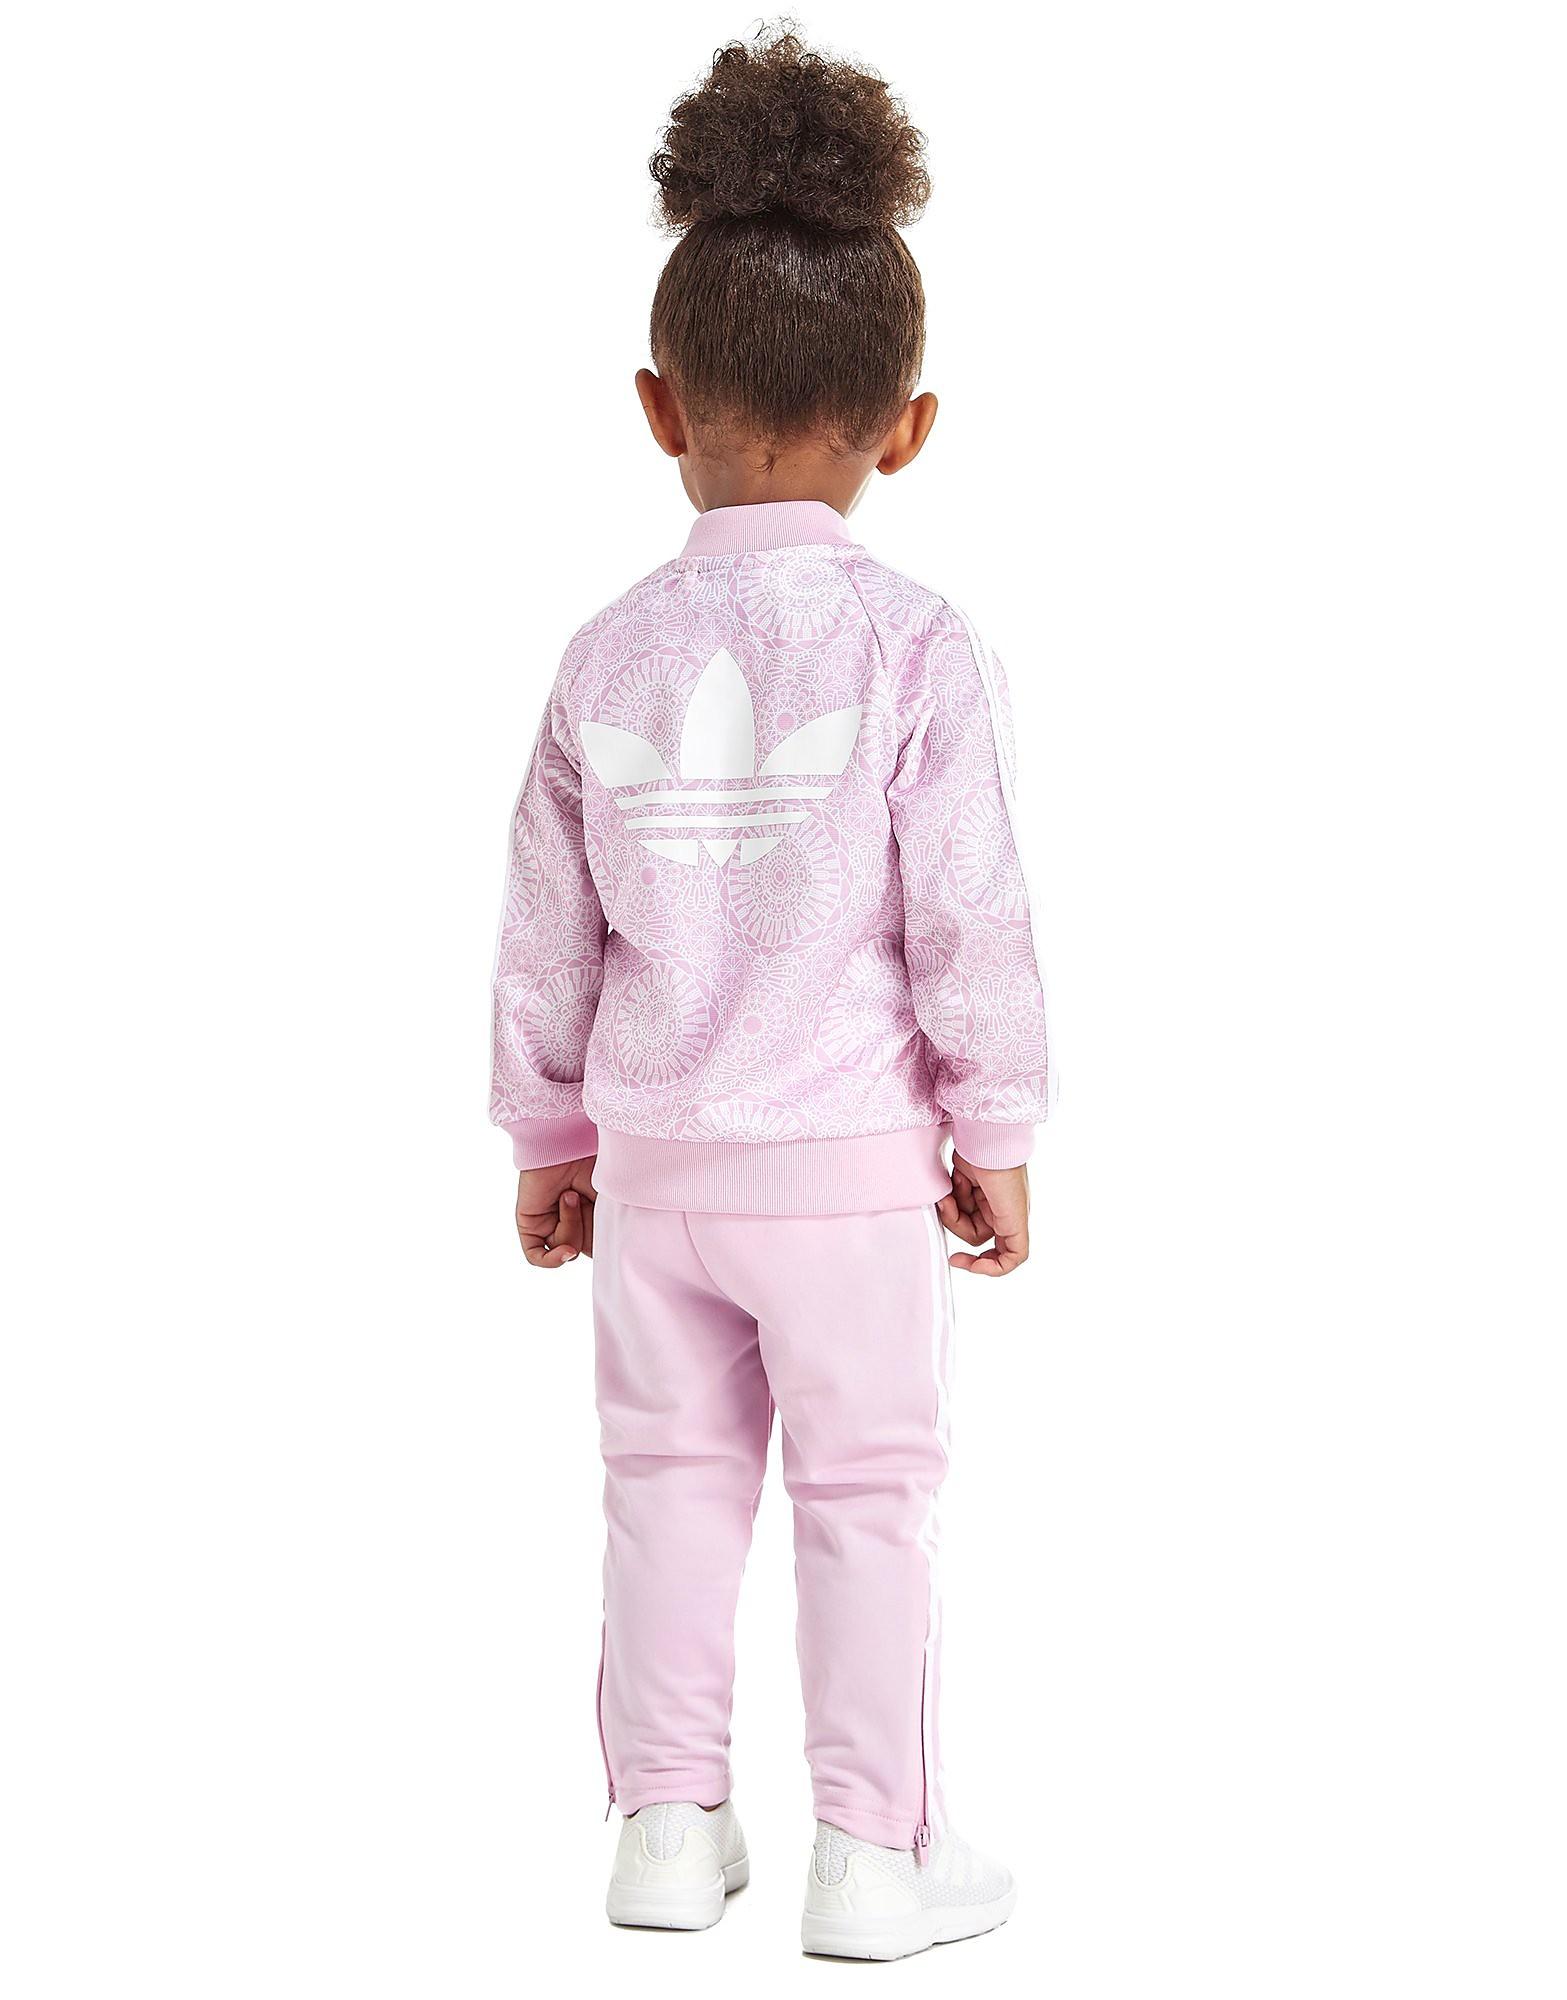 adidas Originals Girls' All Over Print Superstar Tracksuit Baby's